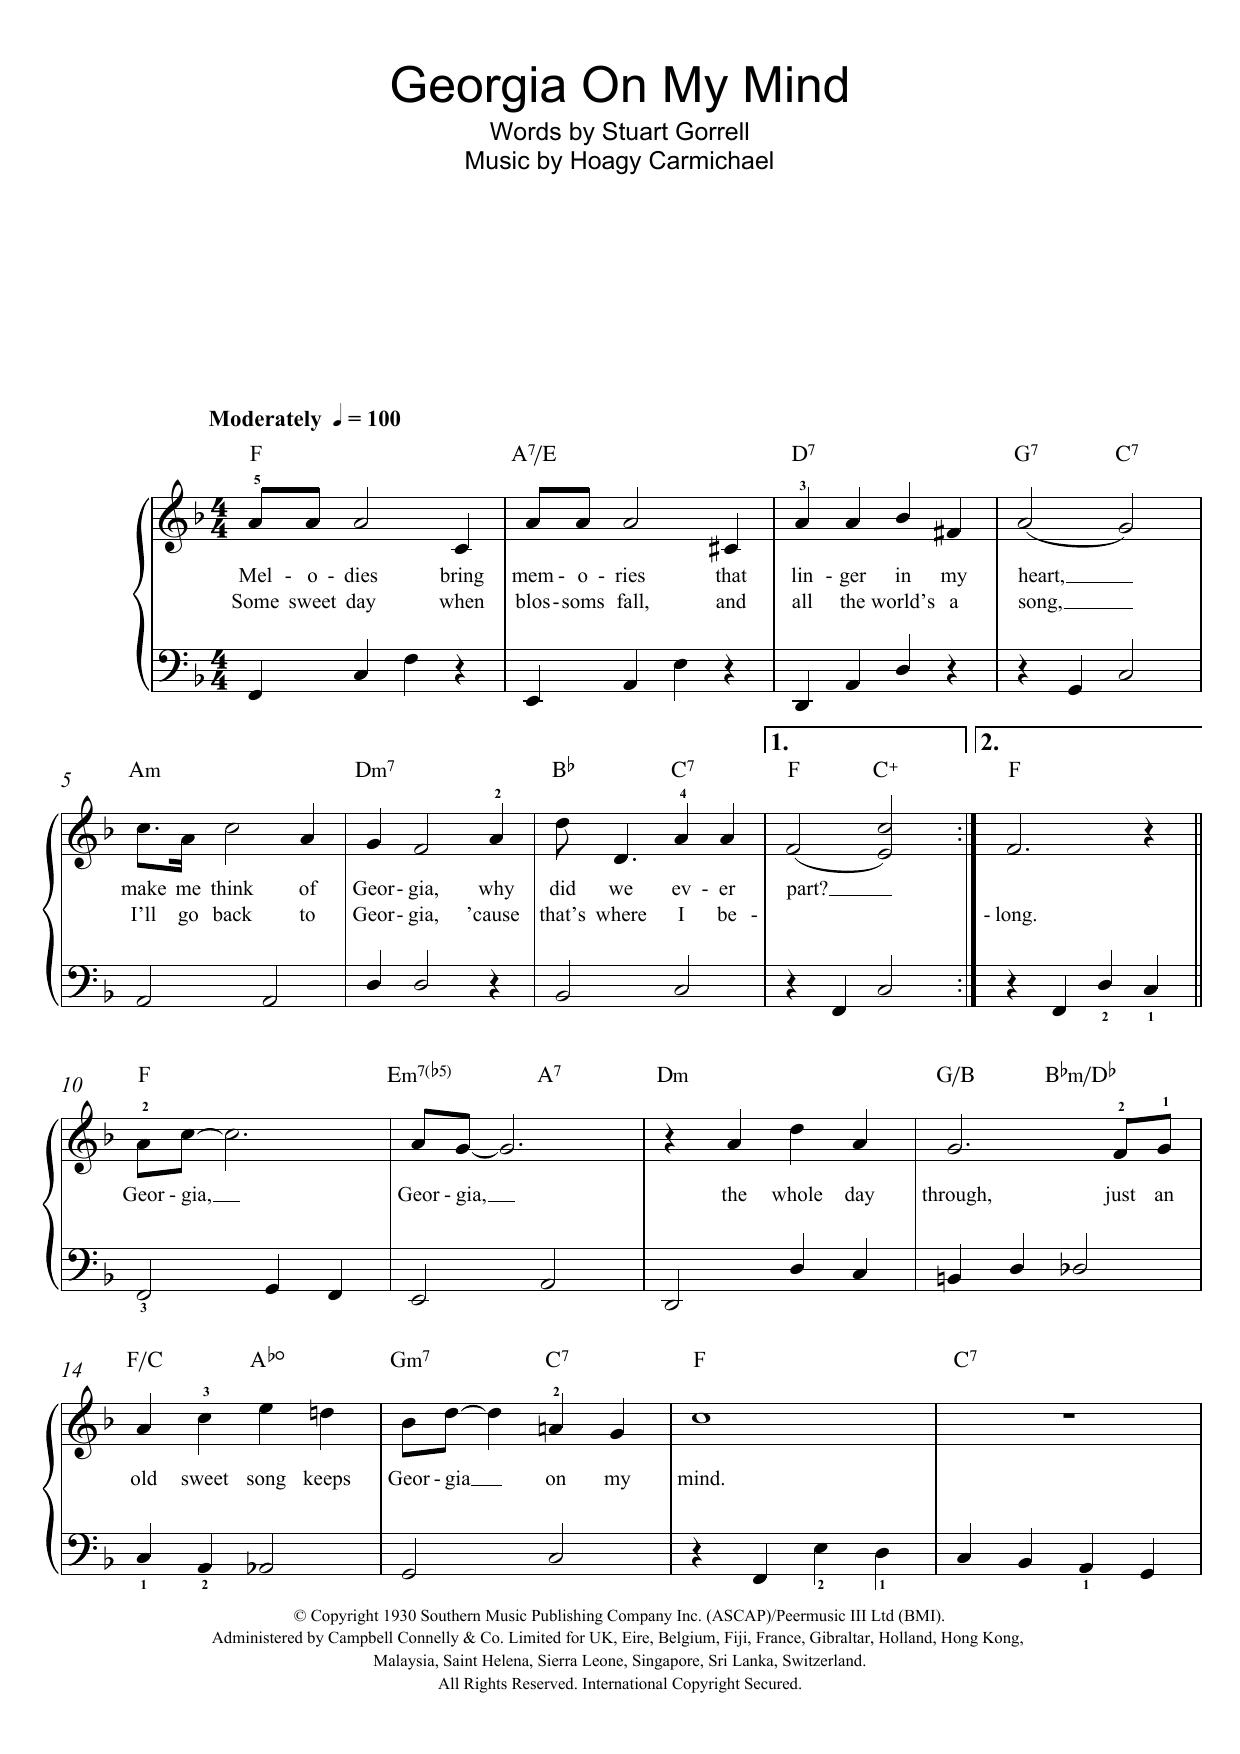 Sheet Music Digital Files To Print Licensed Ray Charles Digital